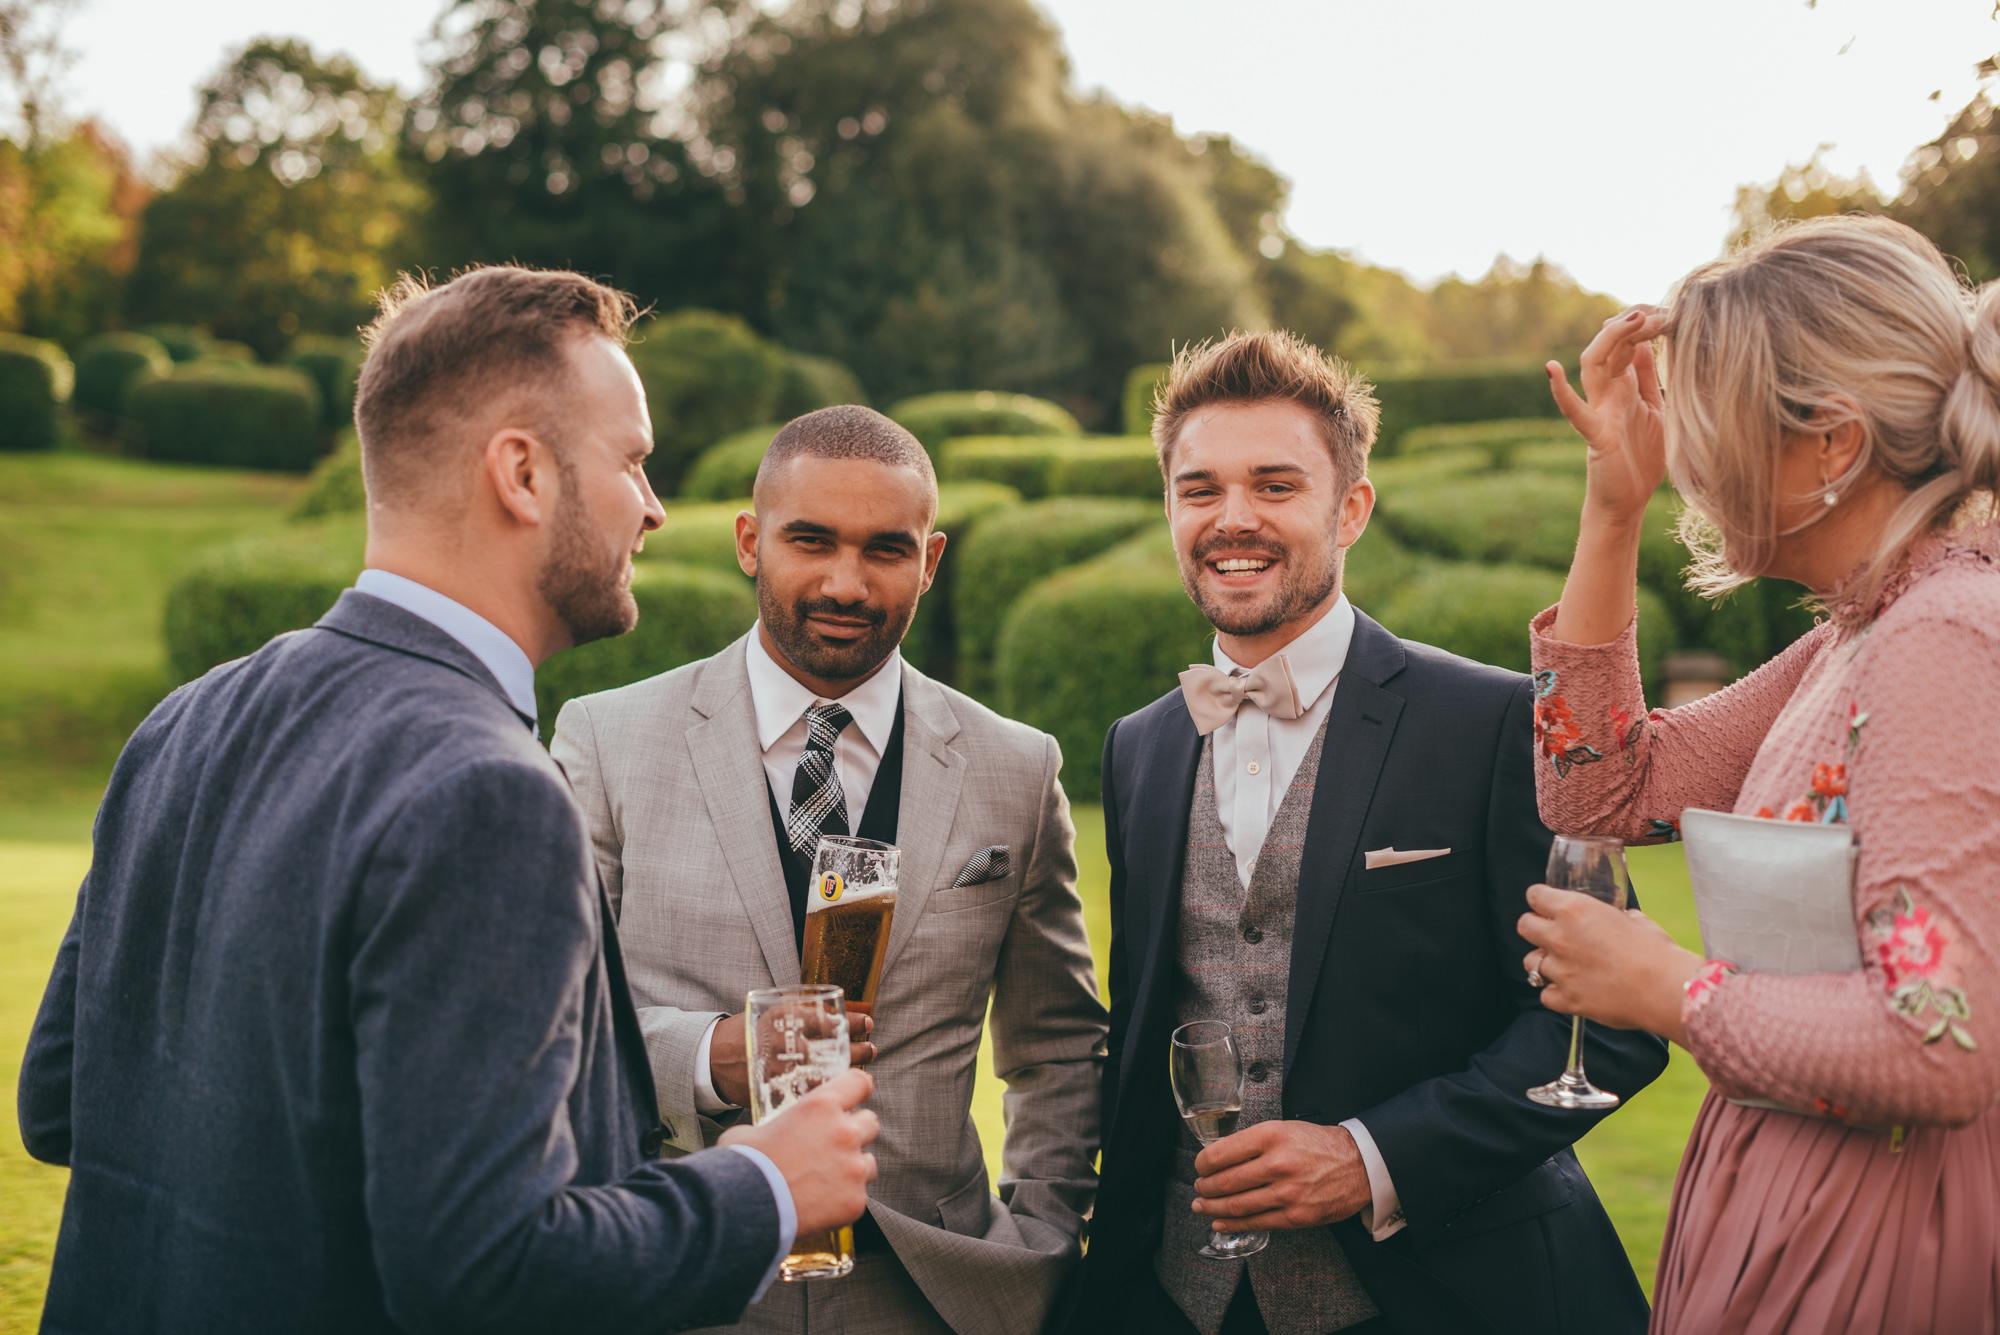 harlaxton-manor-wedding-photographer-141.jpg